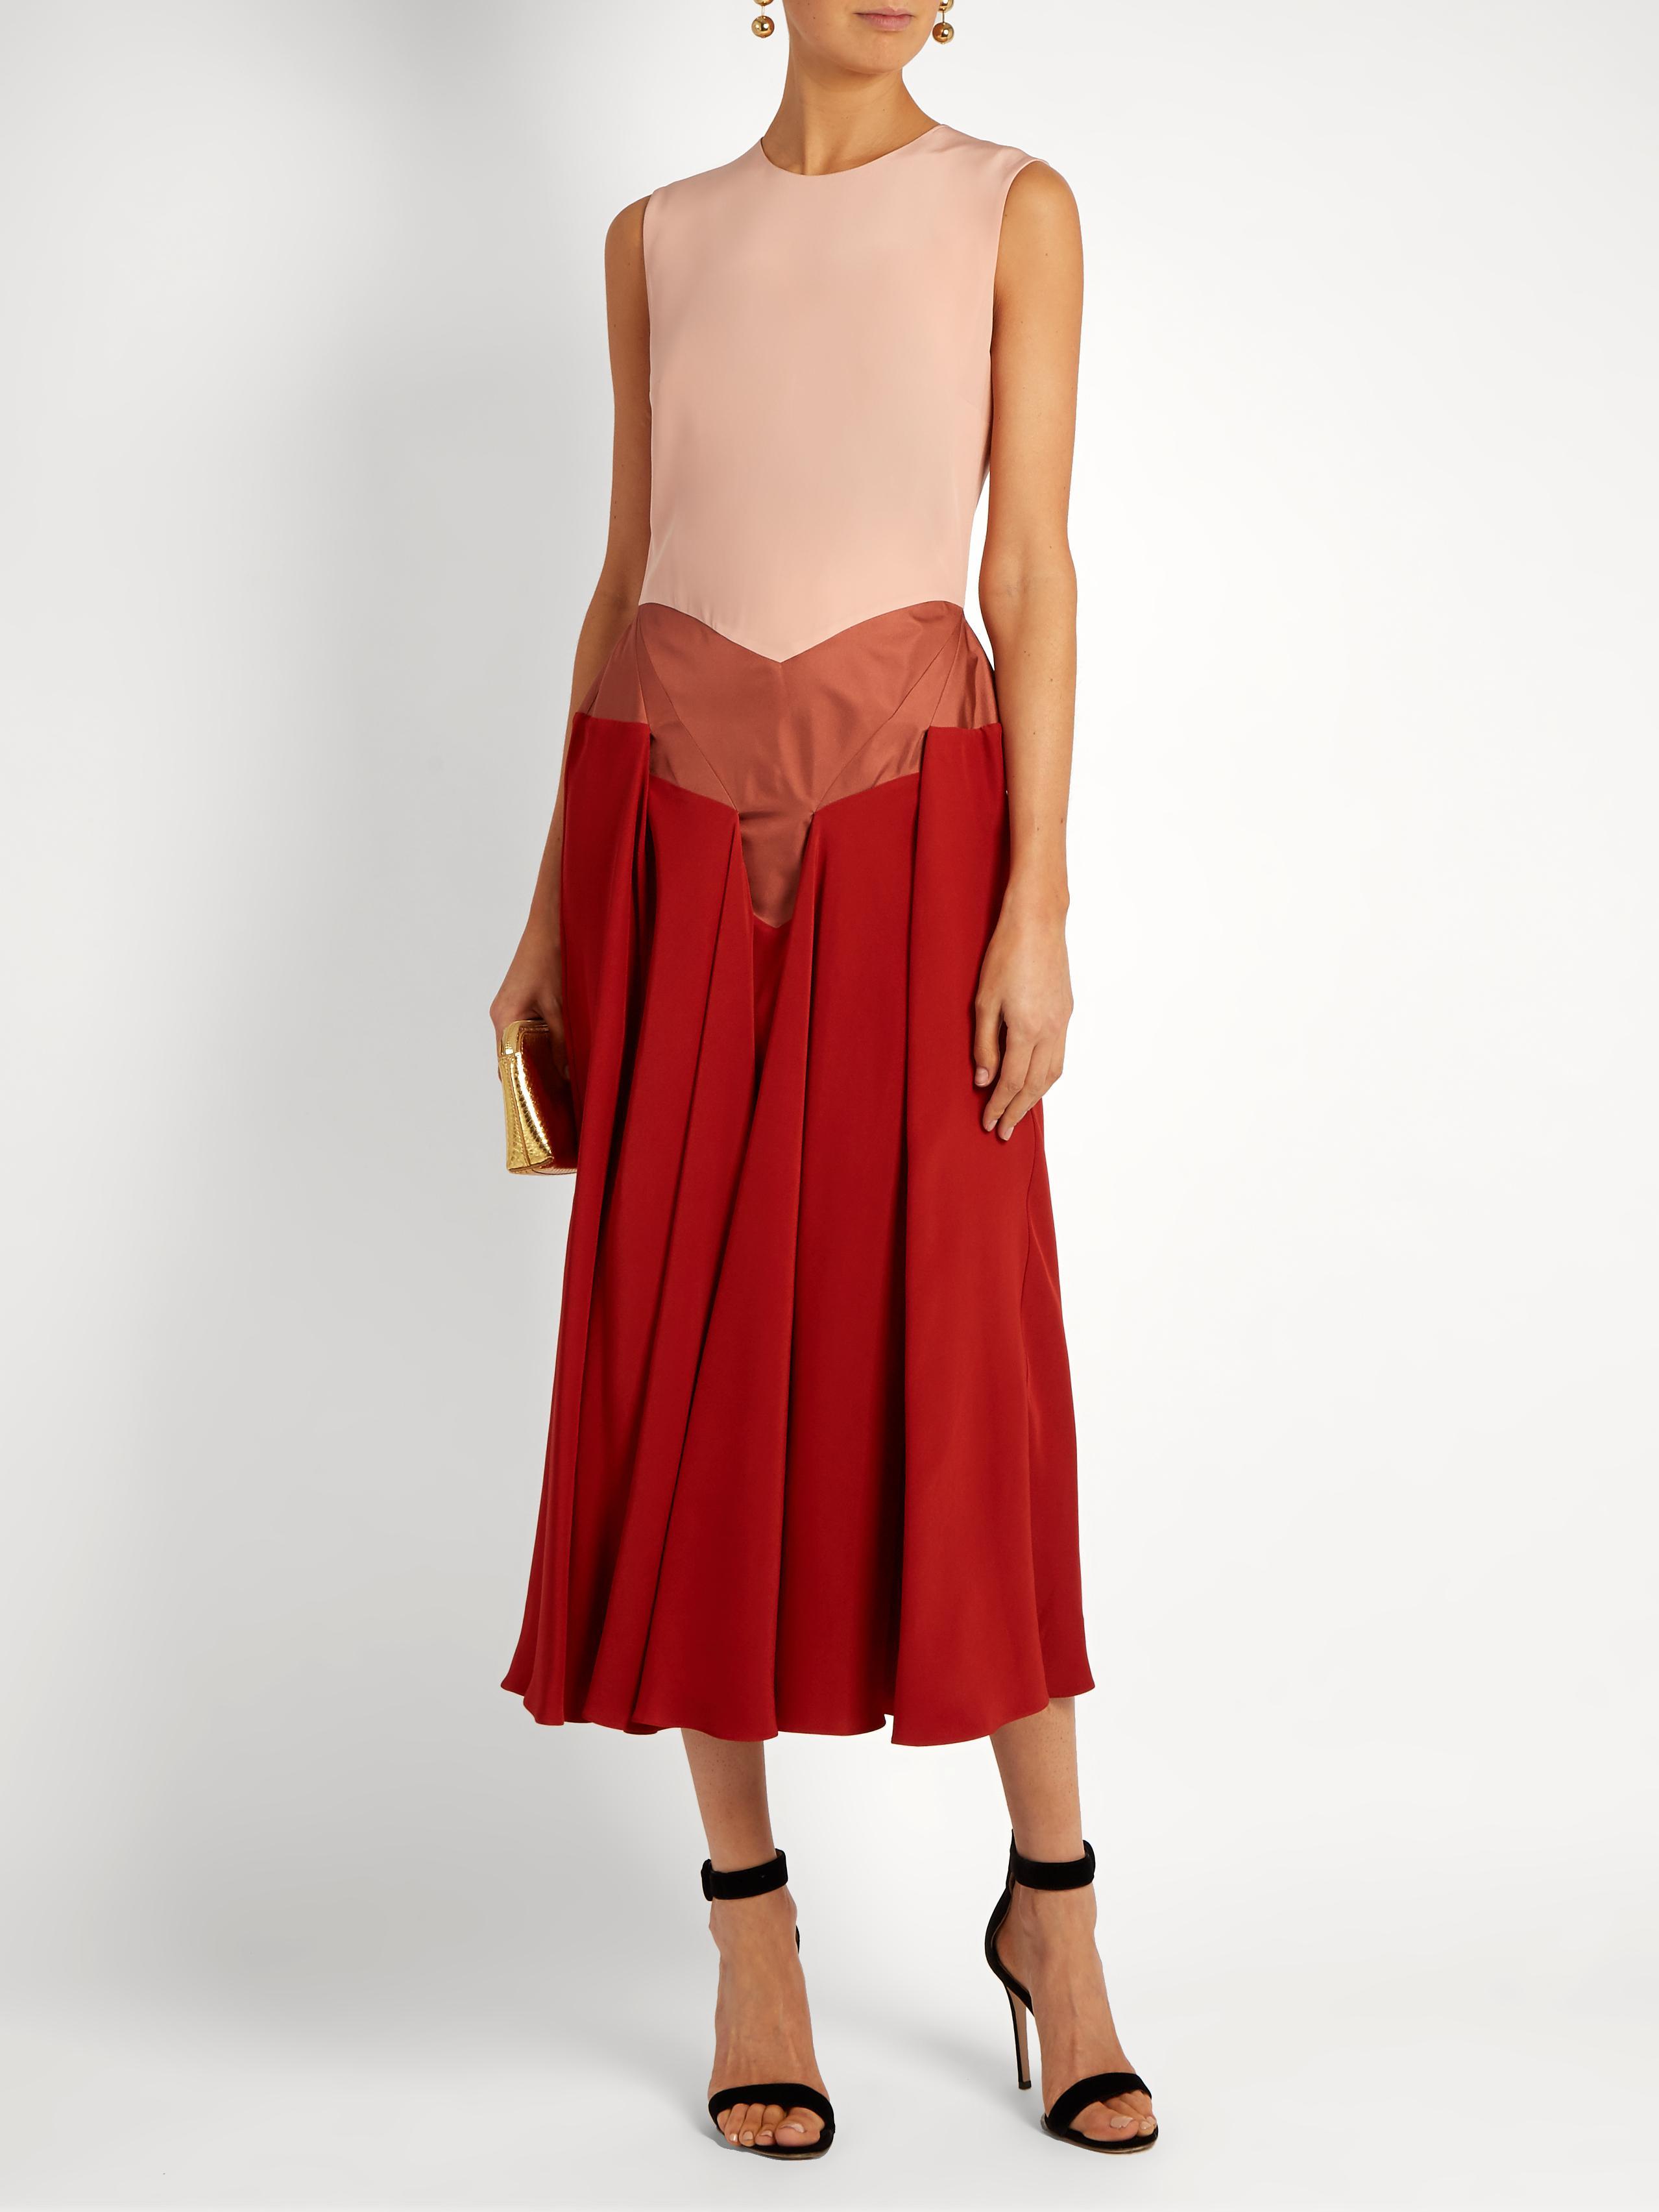 Hayato V-neck tri-colour dress Roksanda Ilincic Outlet 2018 New Finishline The Cheapest Sale Online nO2YIL